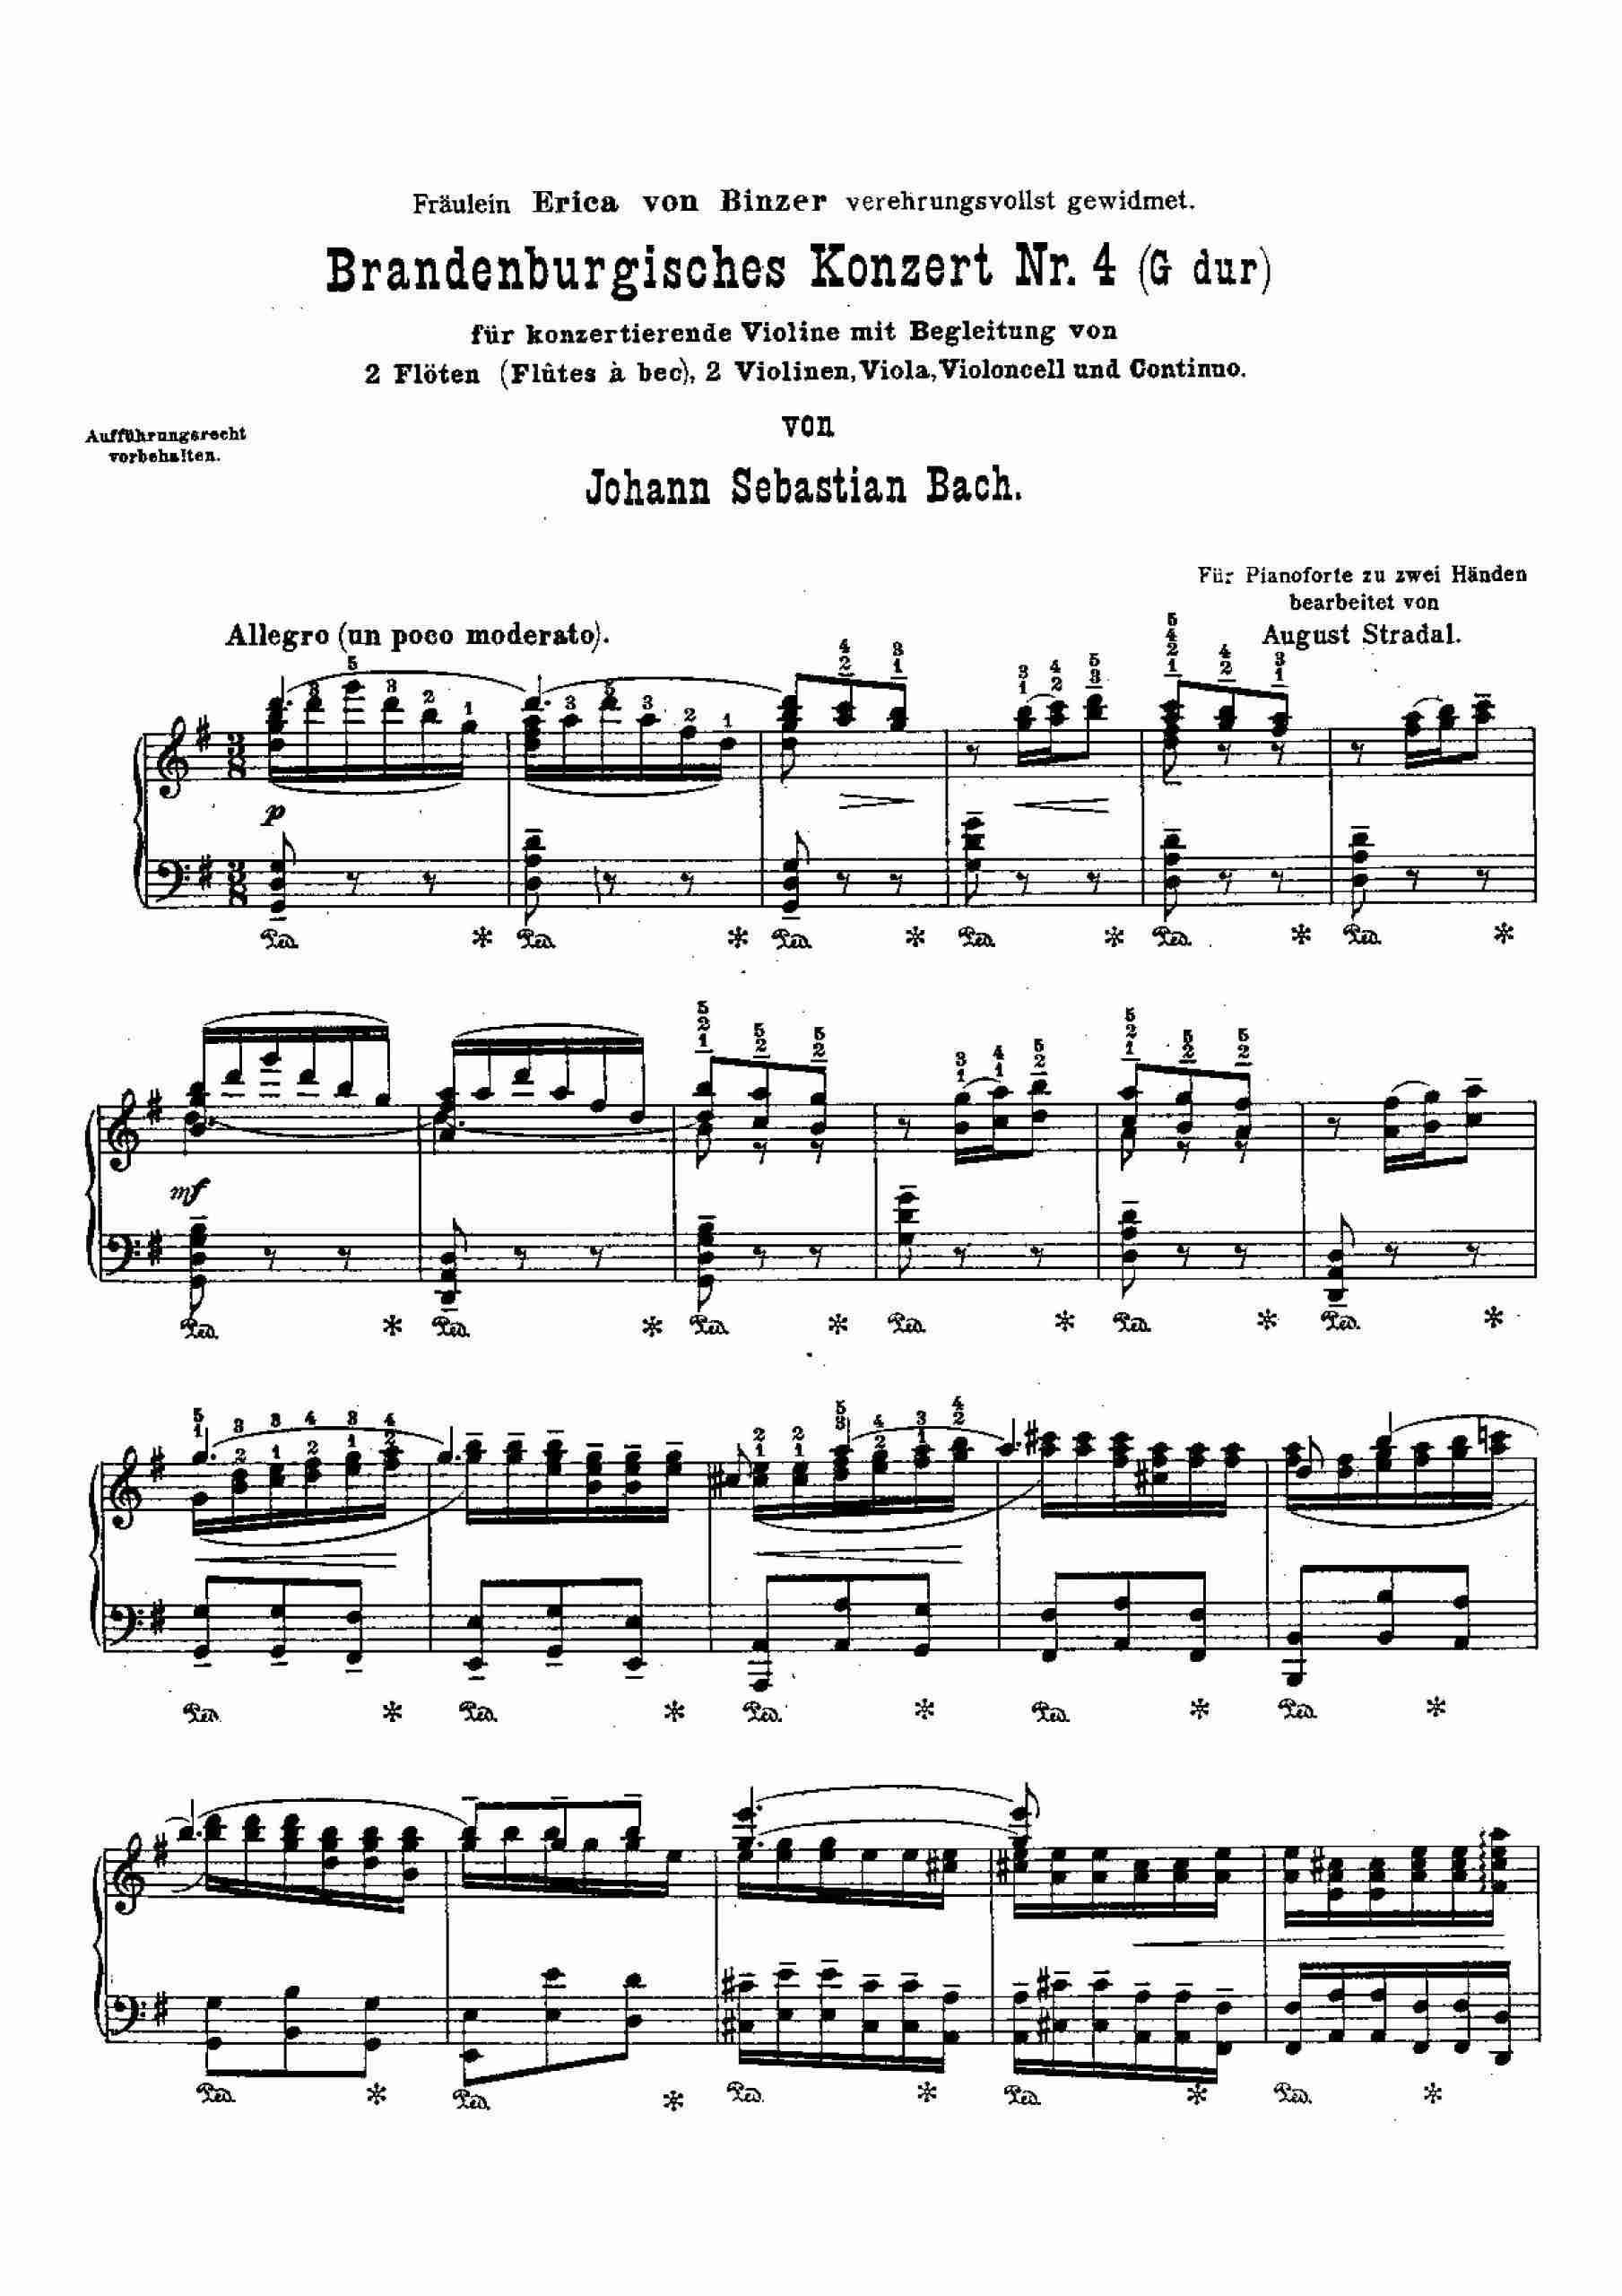 Bach - Brandenburg Concerto No.4 (arr. Stradal)